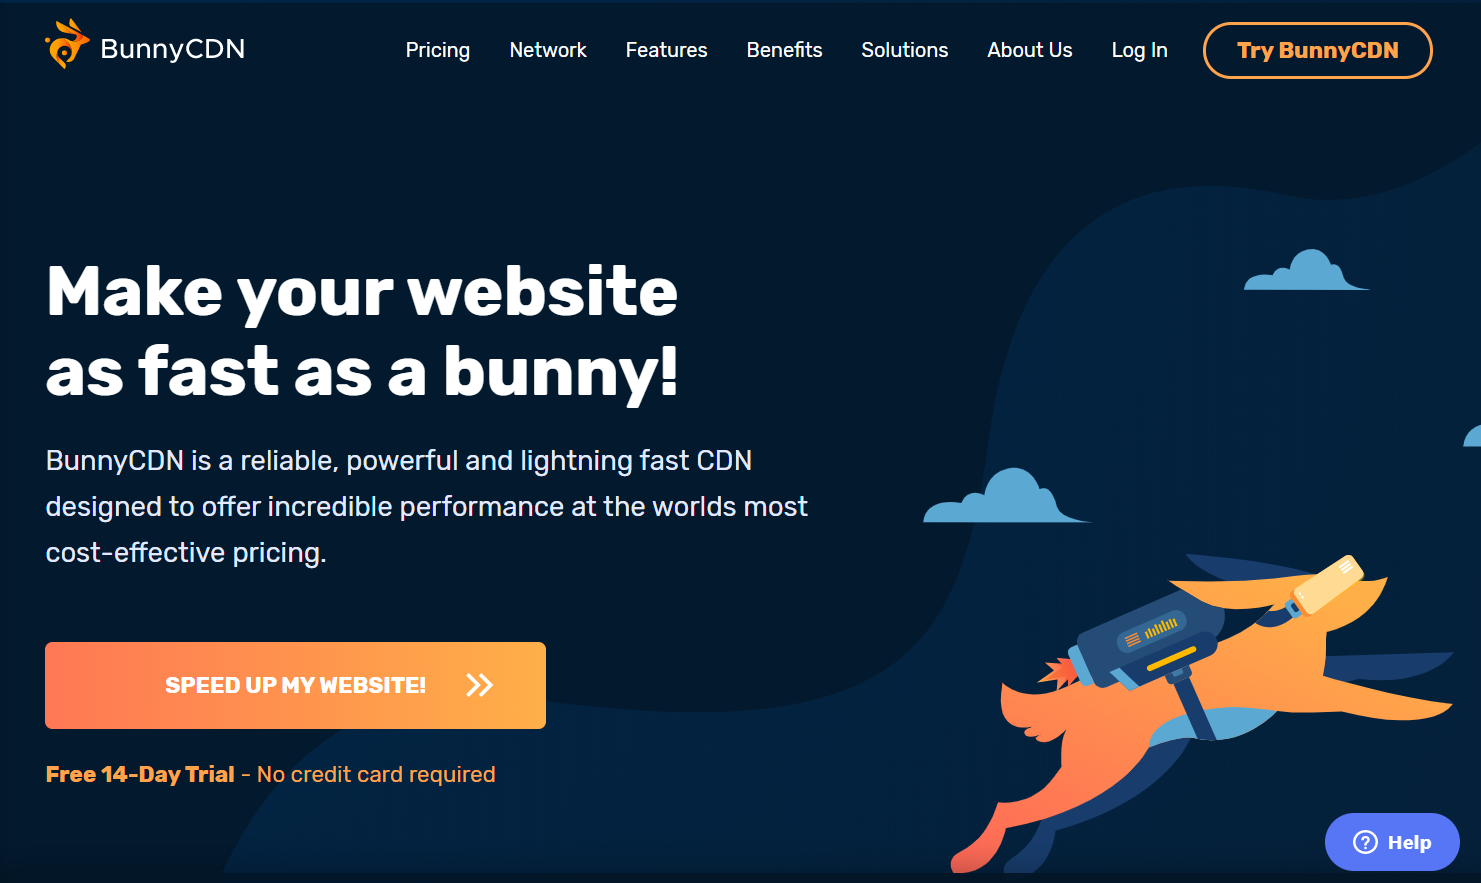 Bunny CDN